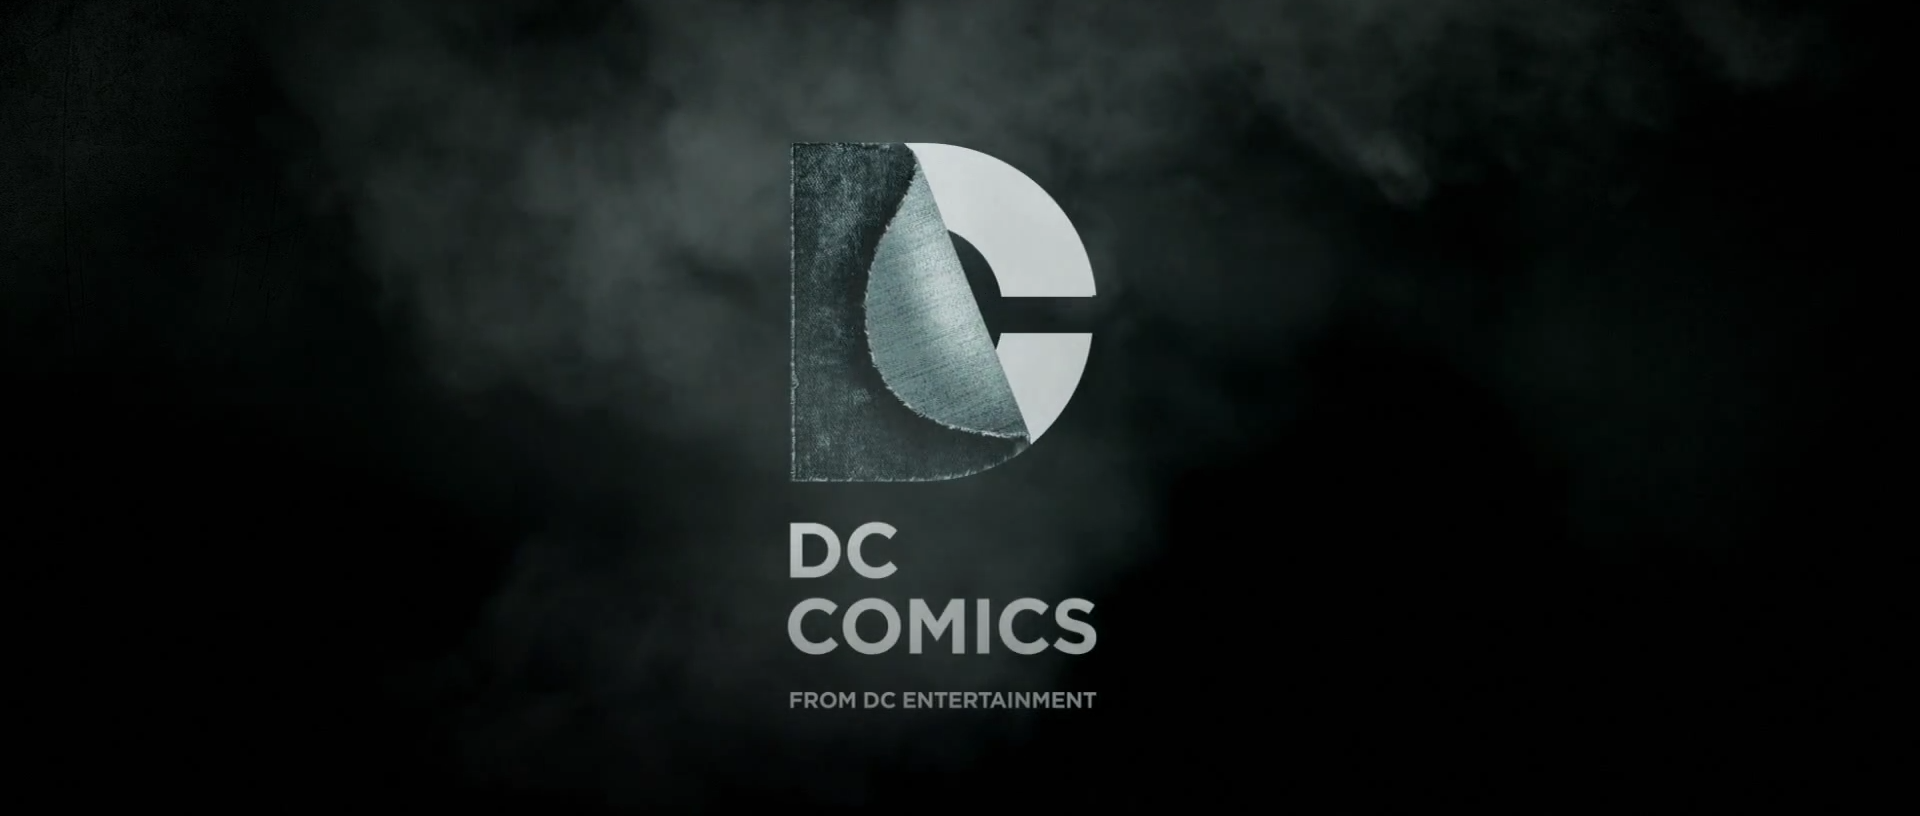 dc-comics-logo-